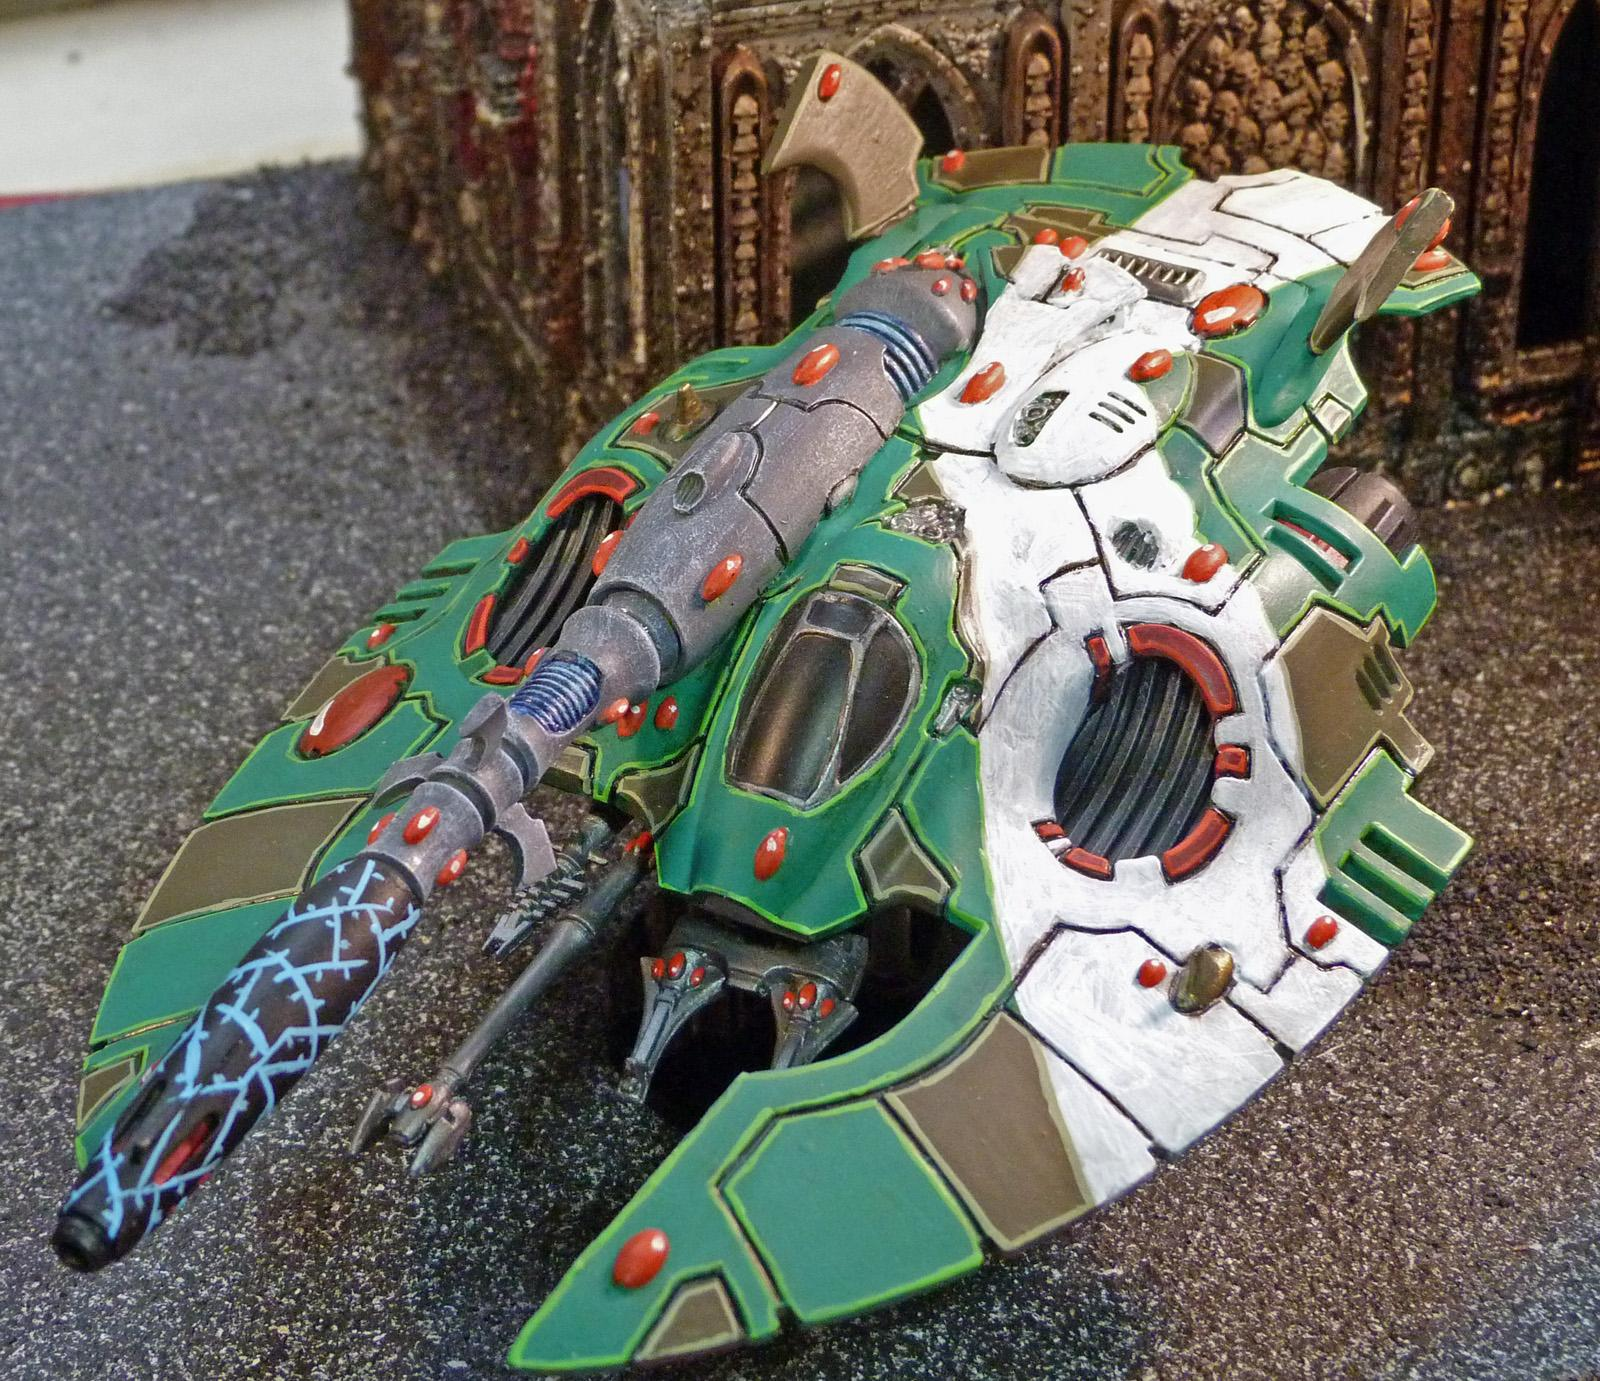 Biel, Eldar, Tan, Warhammer 40,000